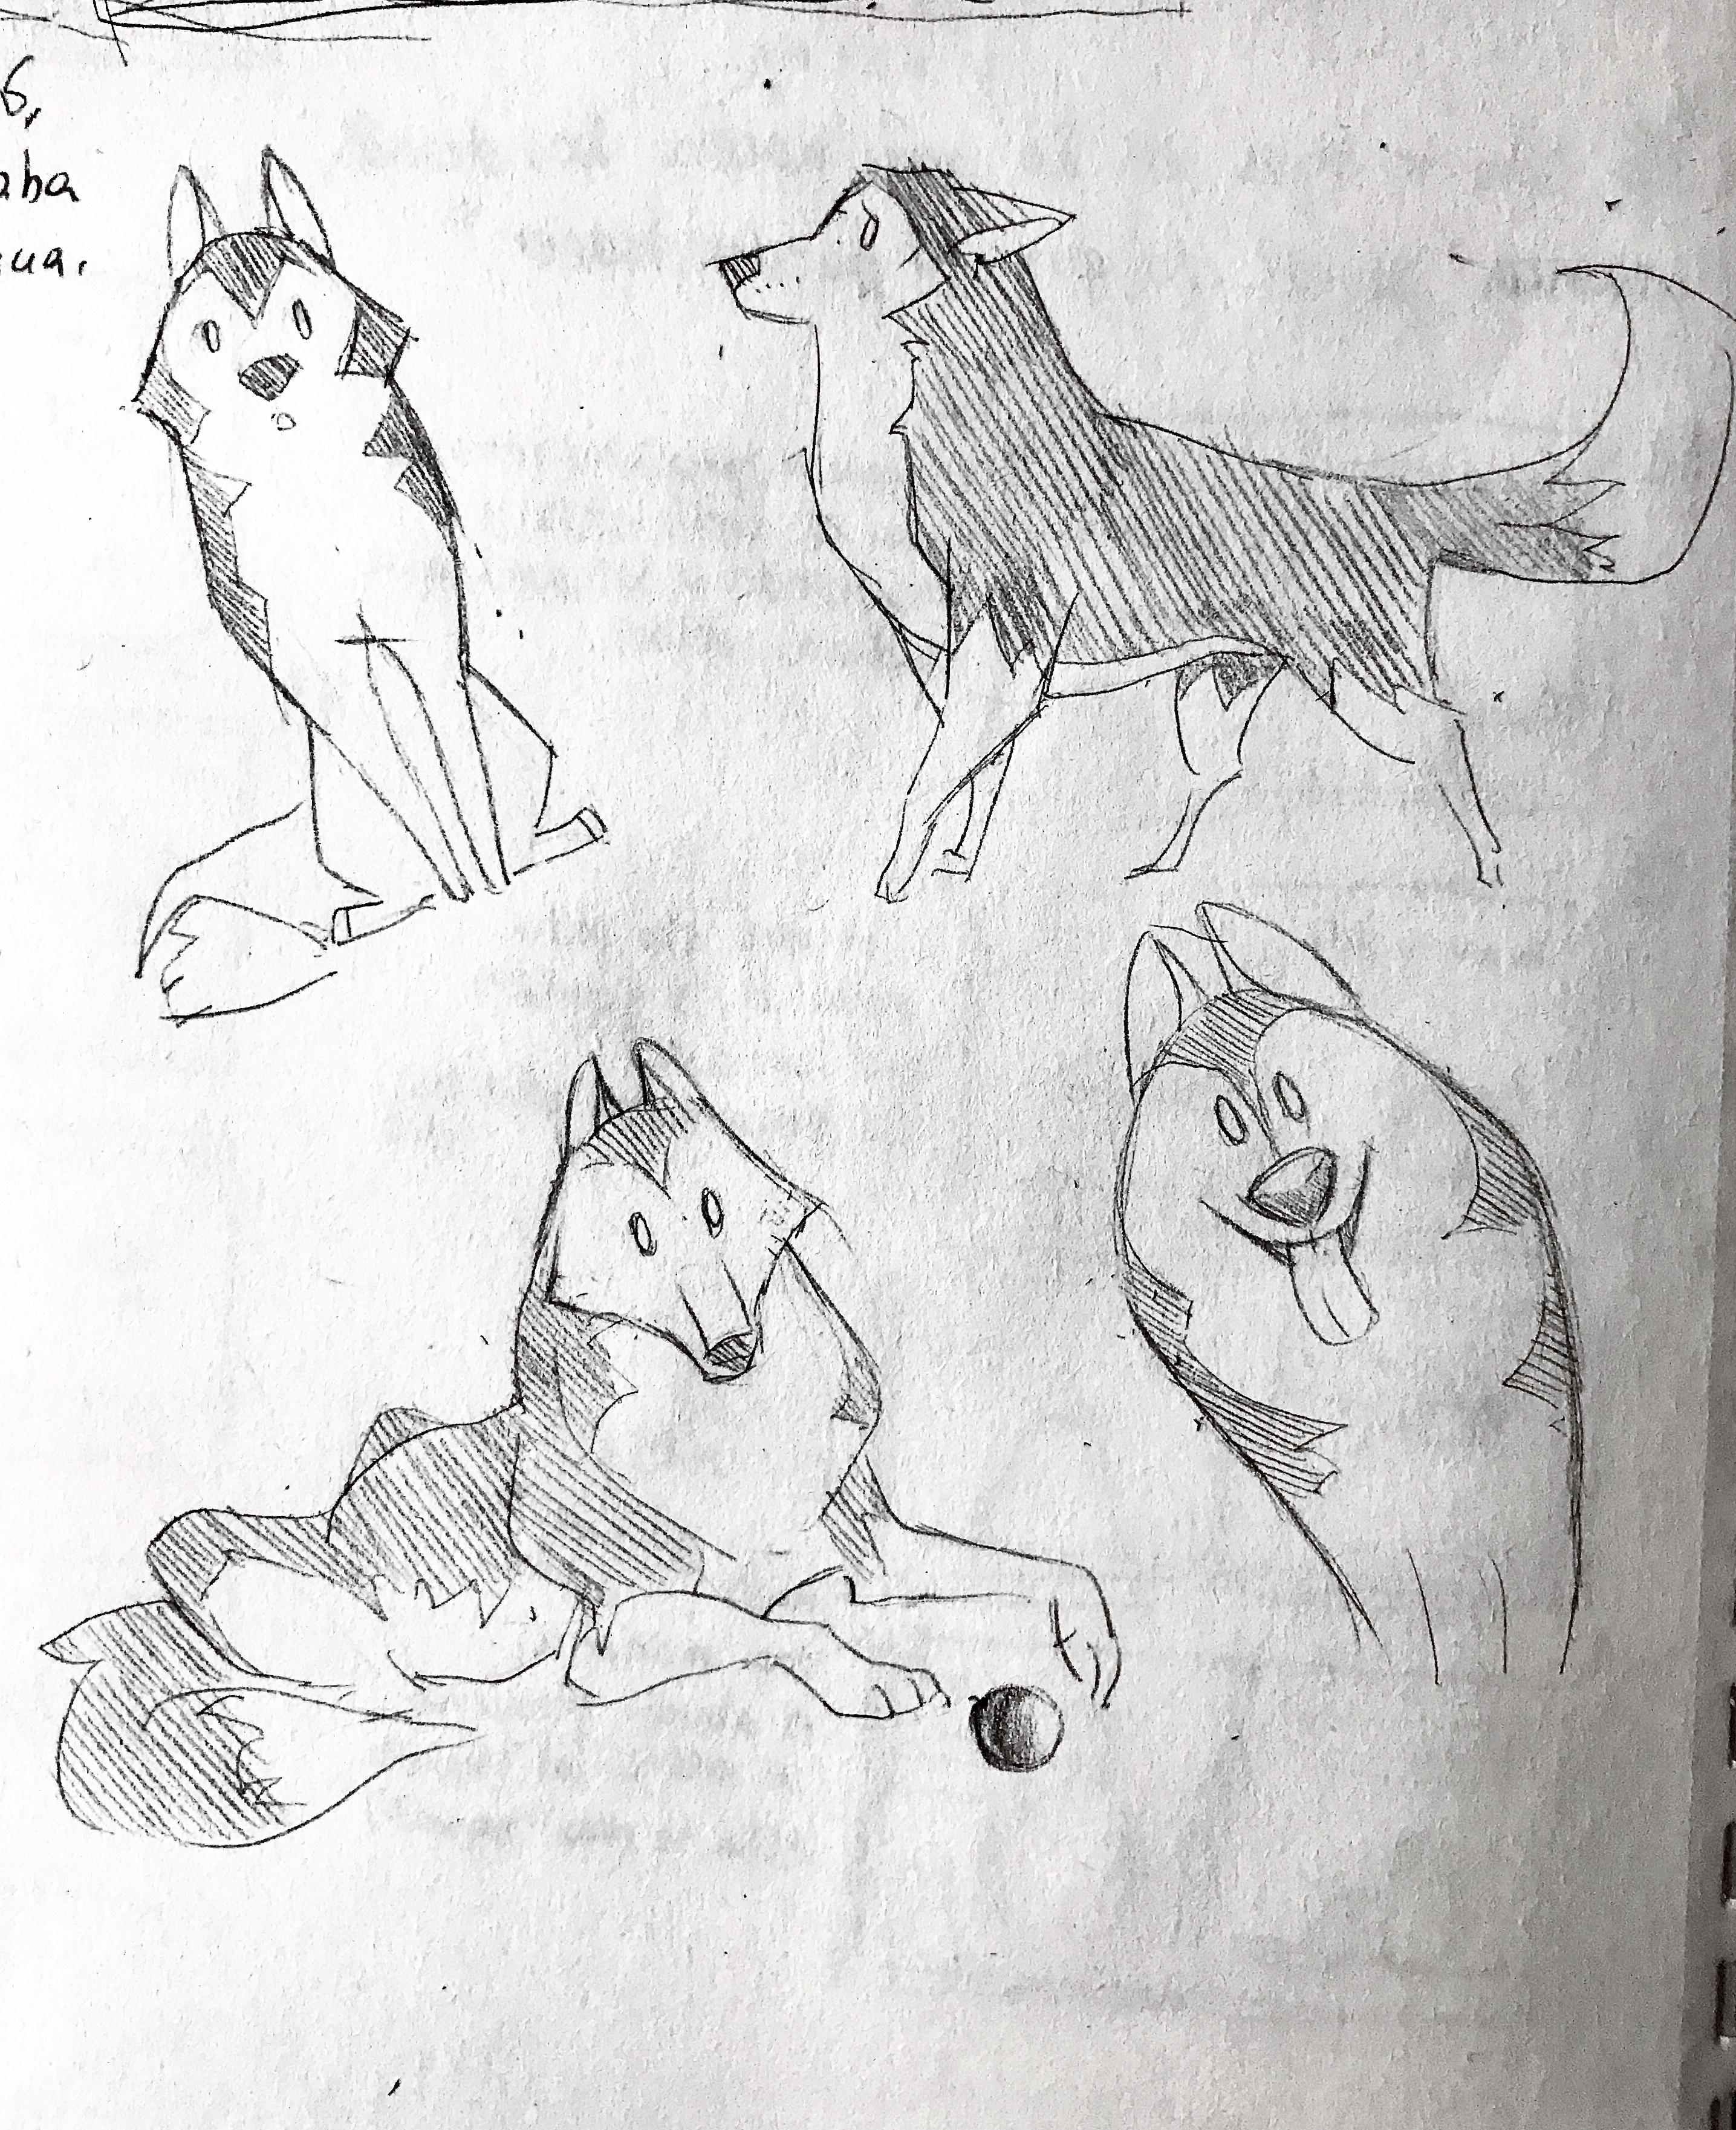 Husky sketches